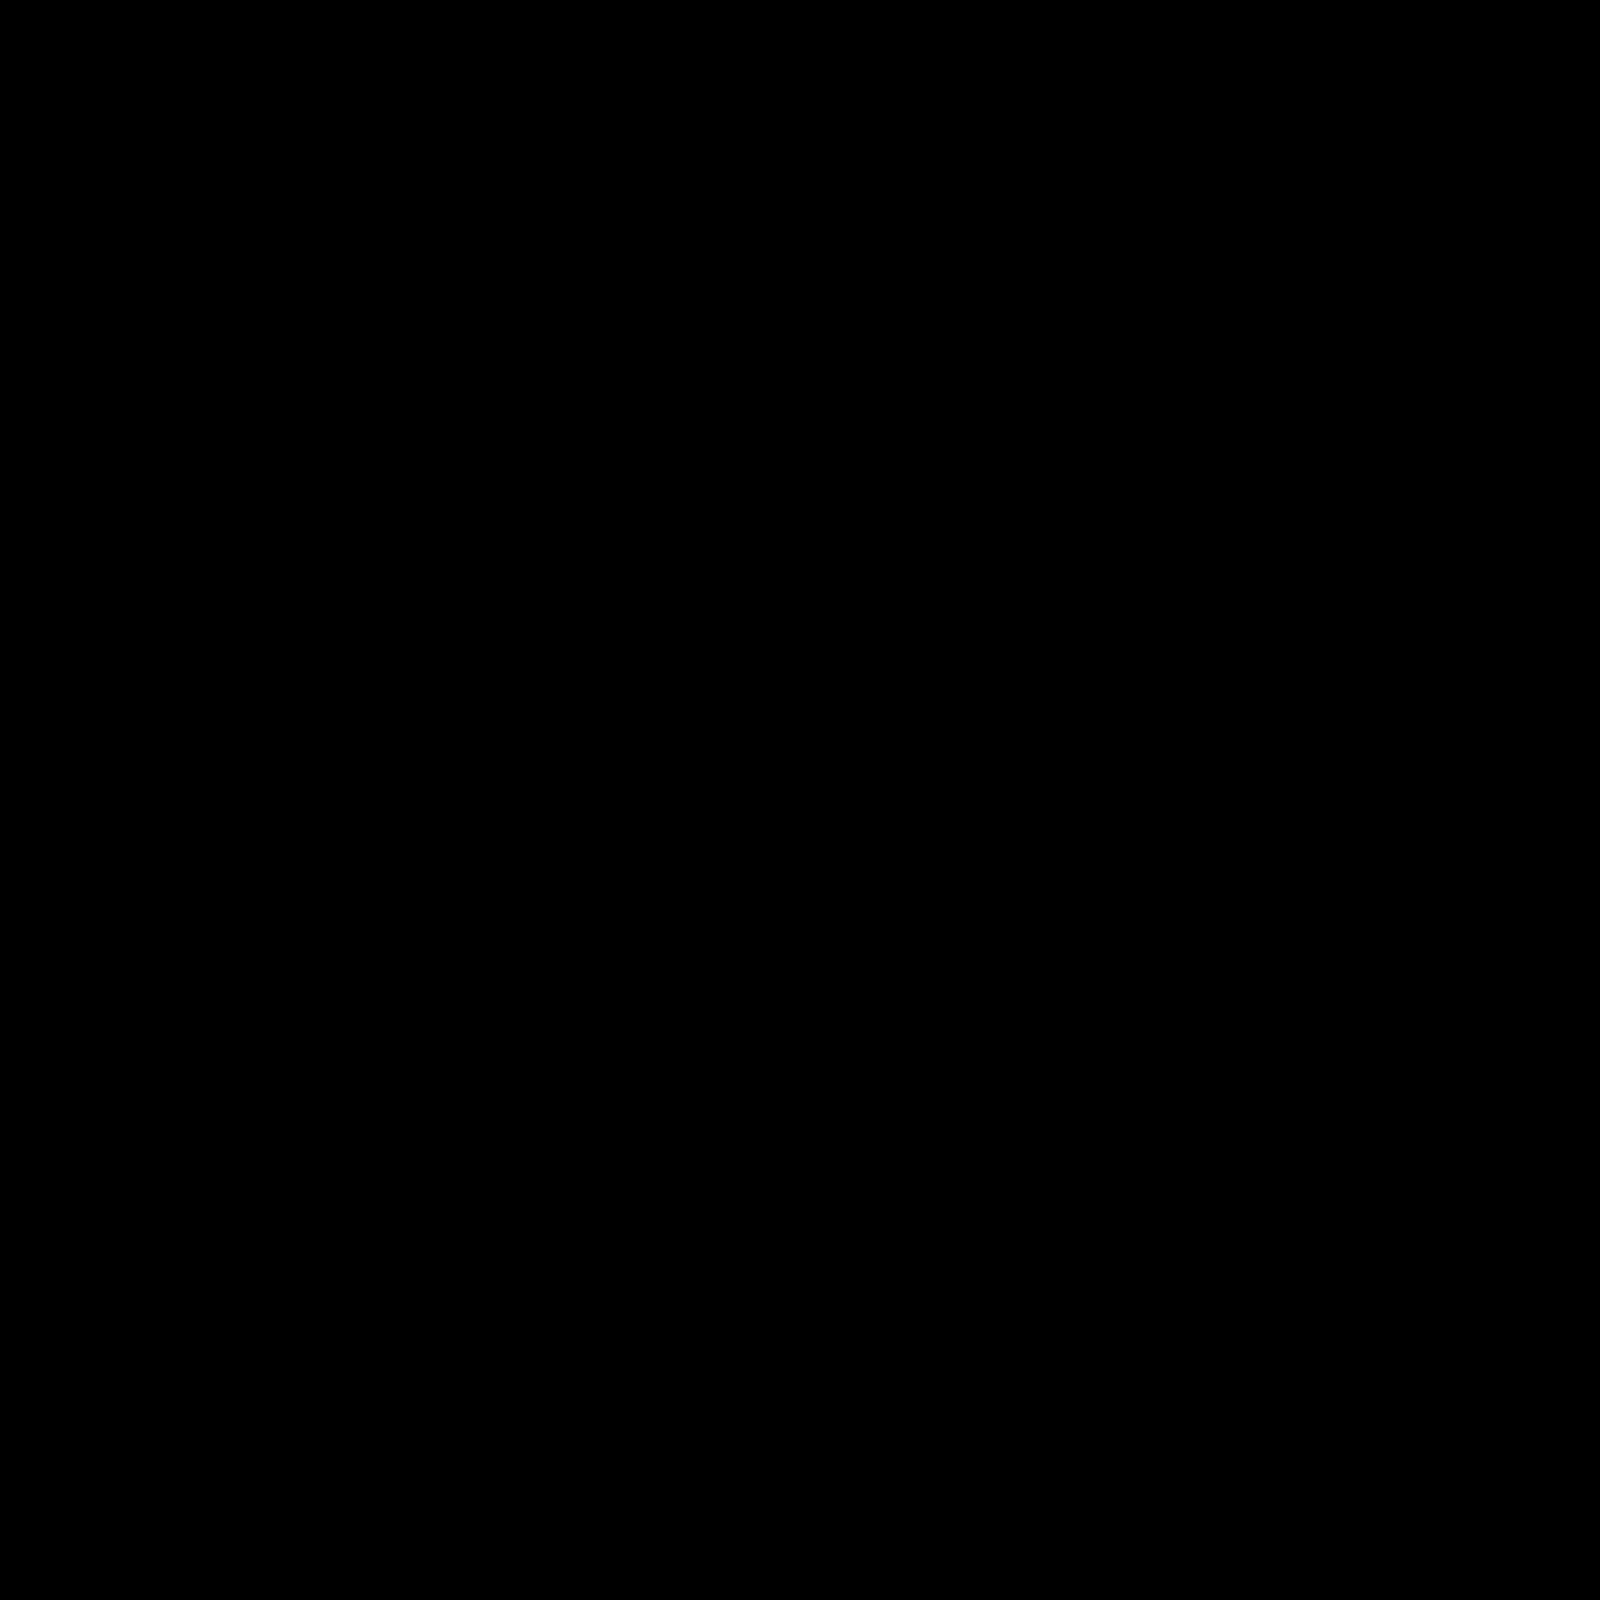 Windows 10 Store icon